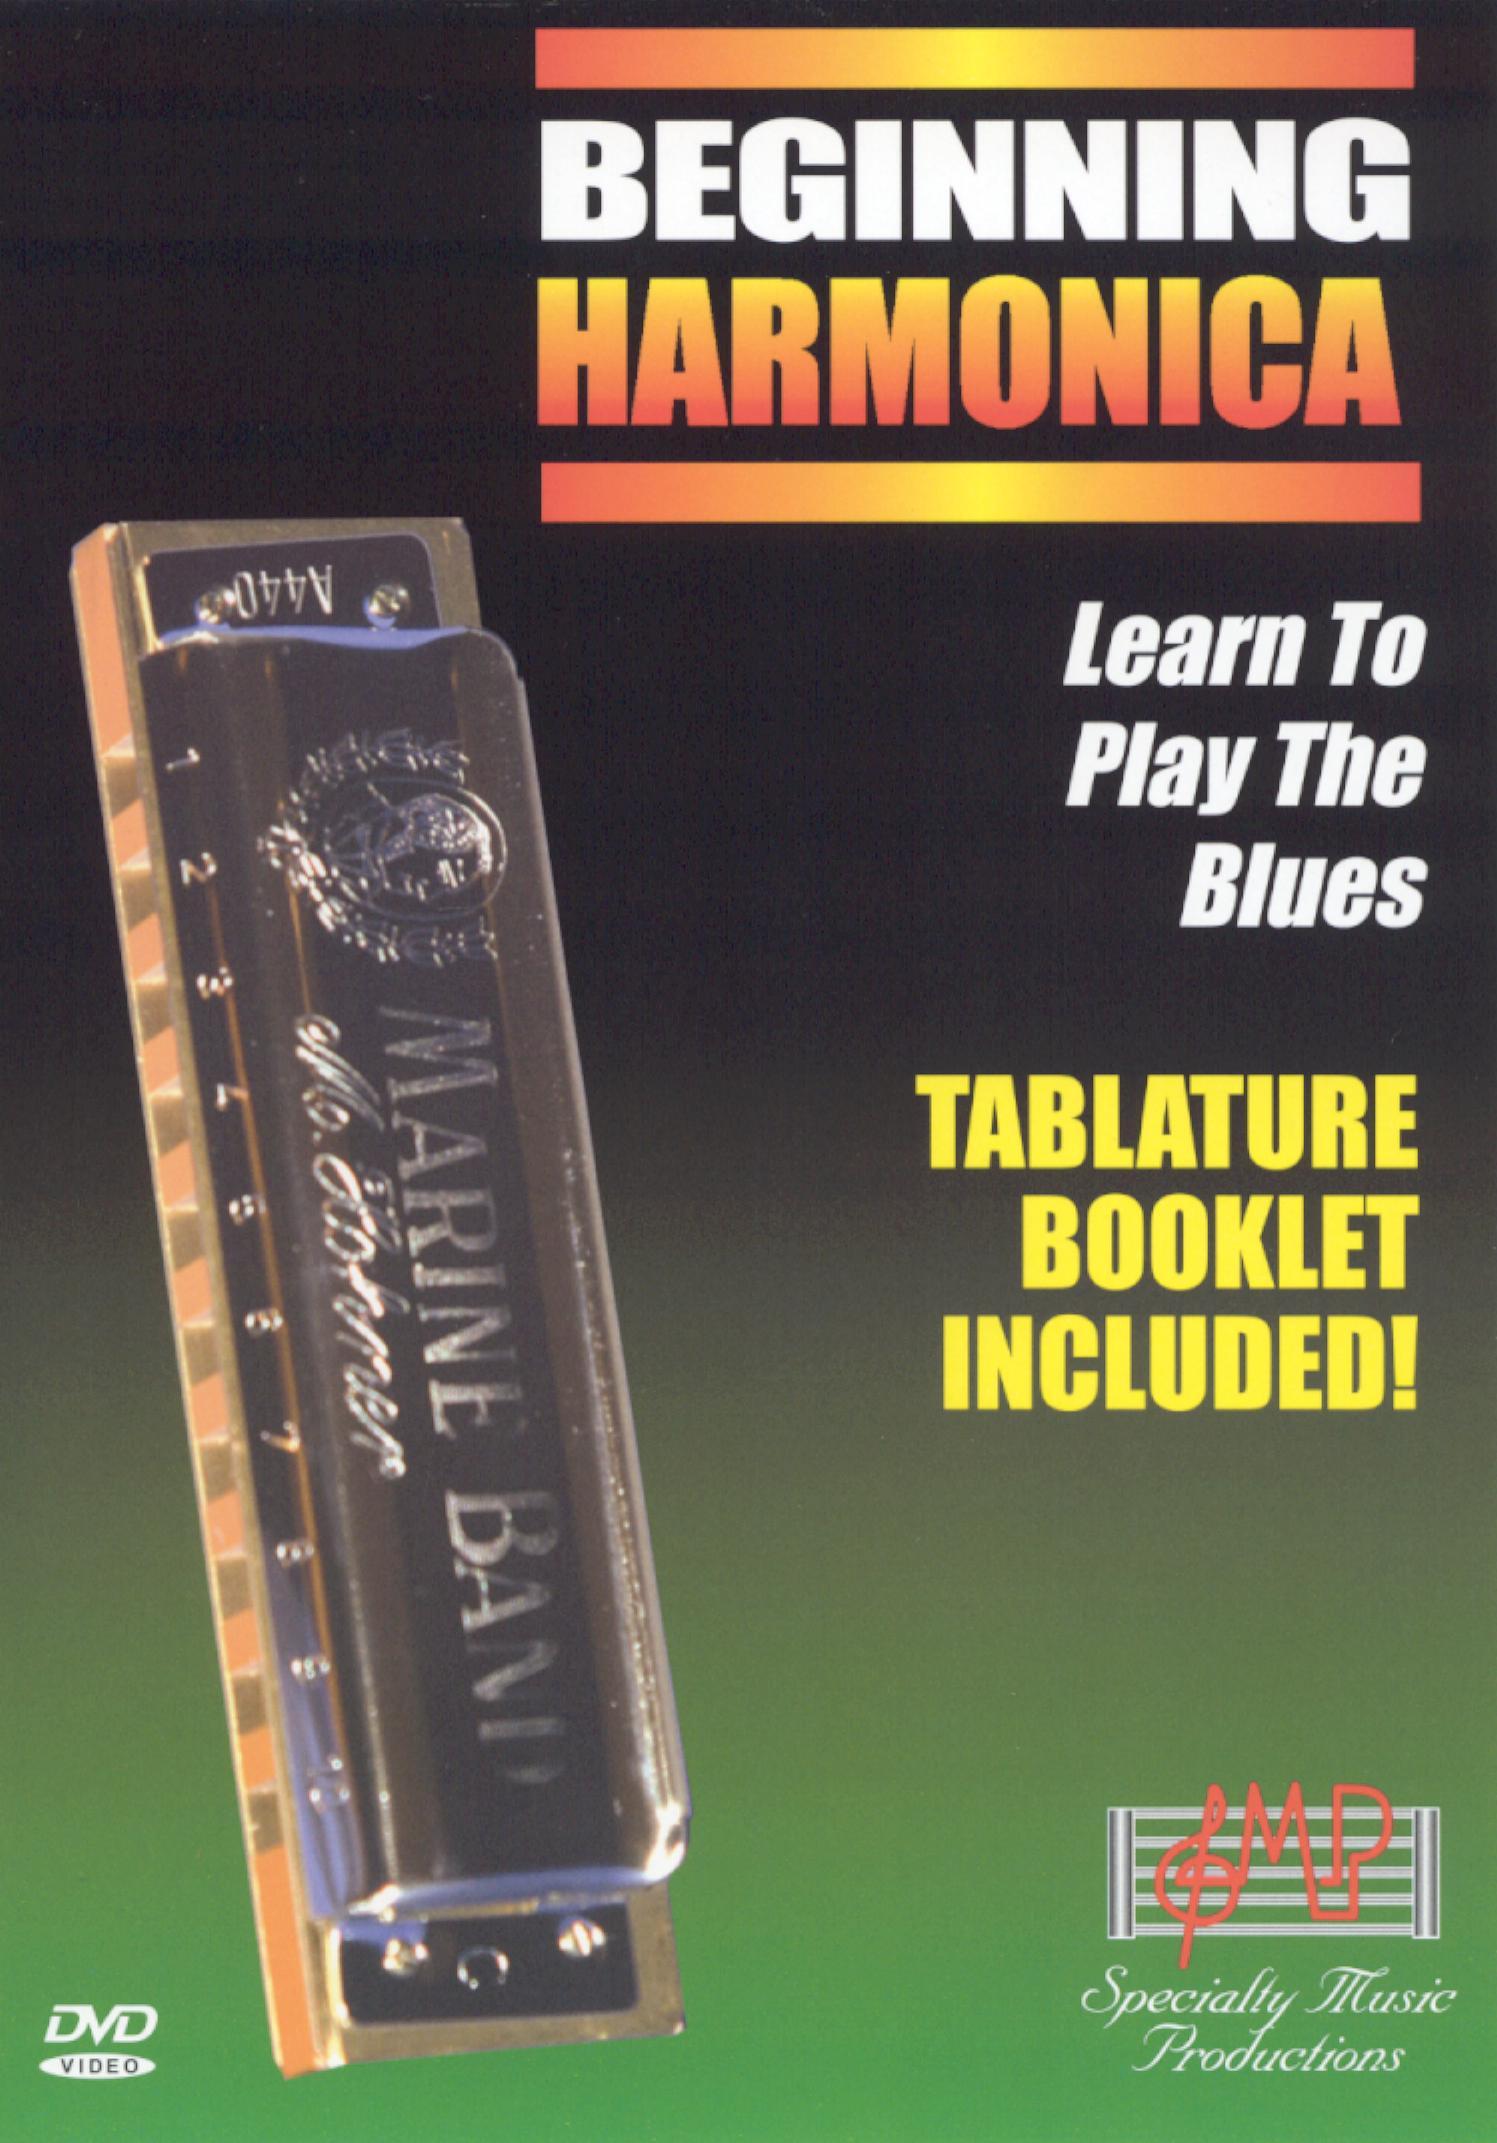 SMP Series: Beginning Harmonica